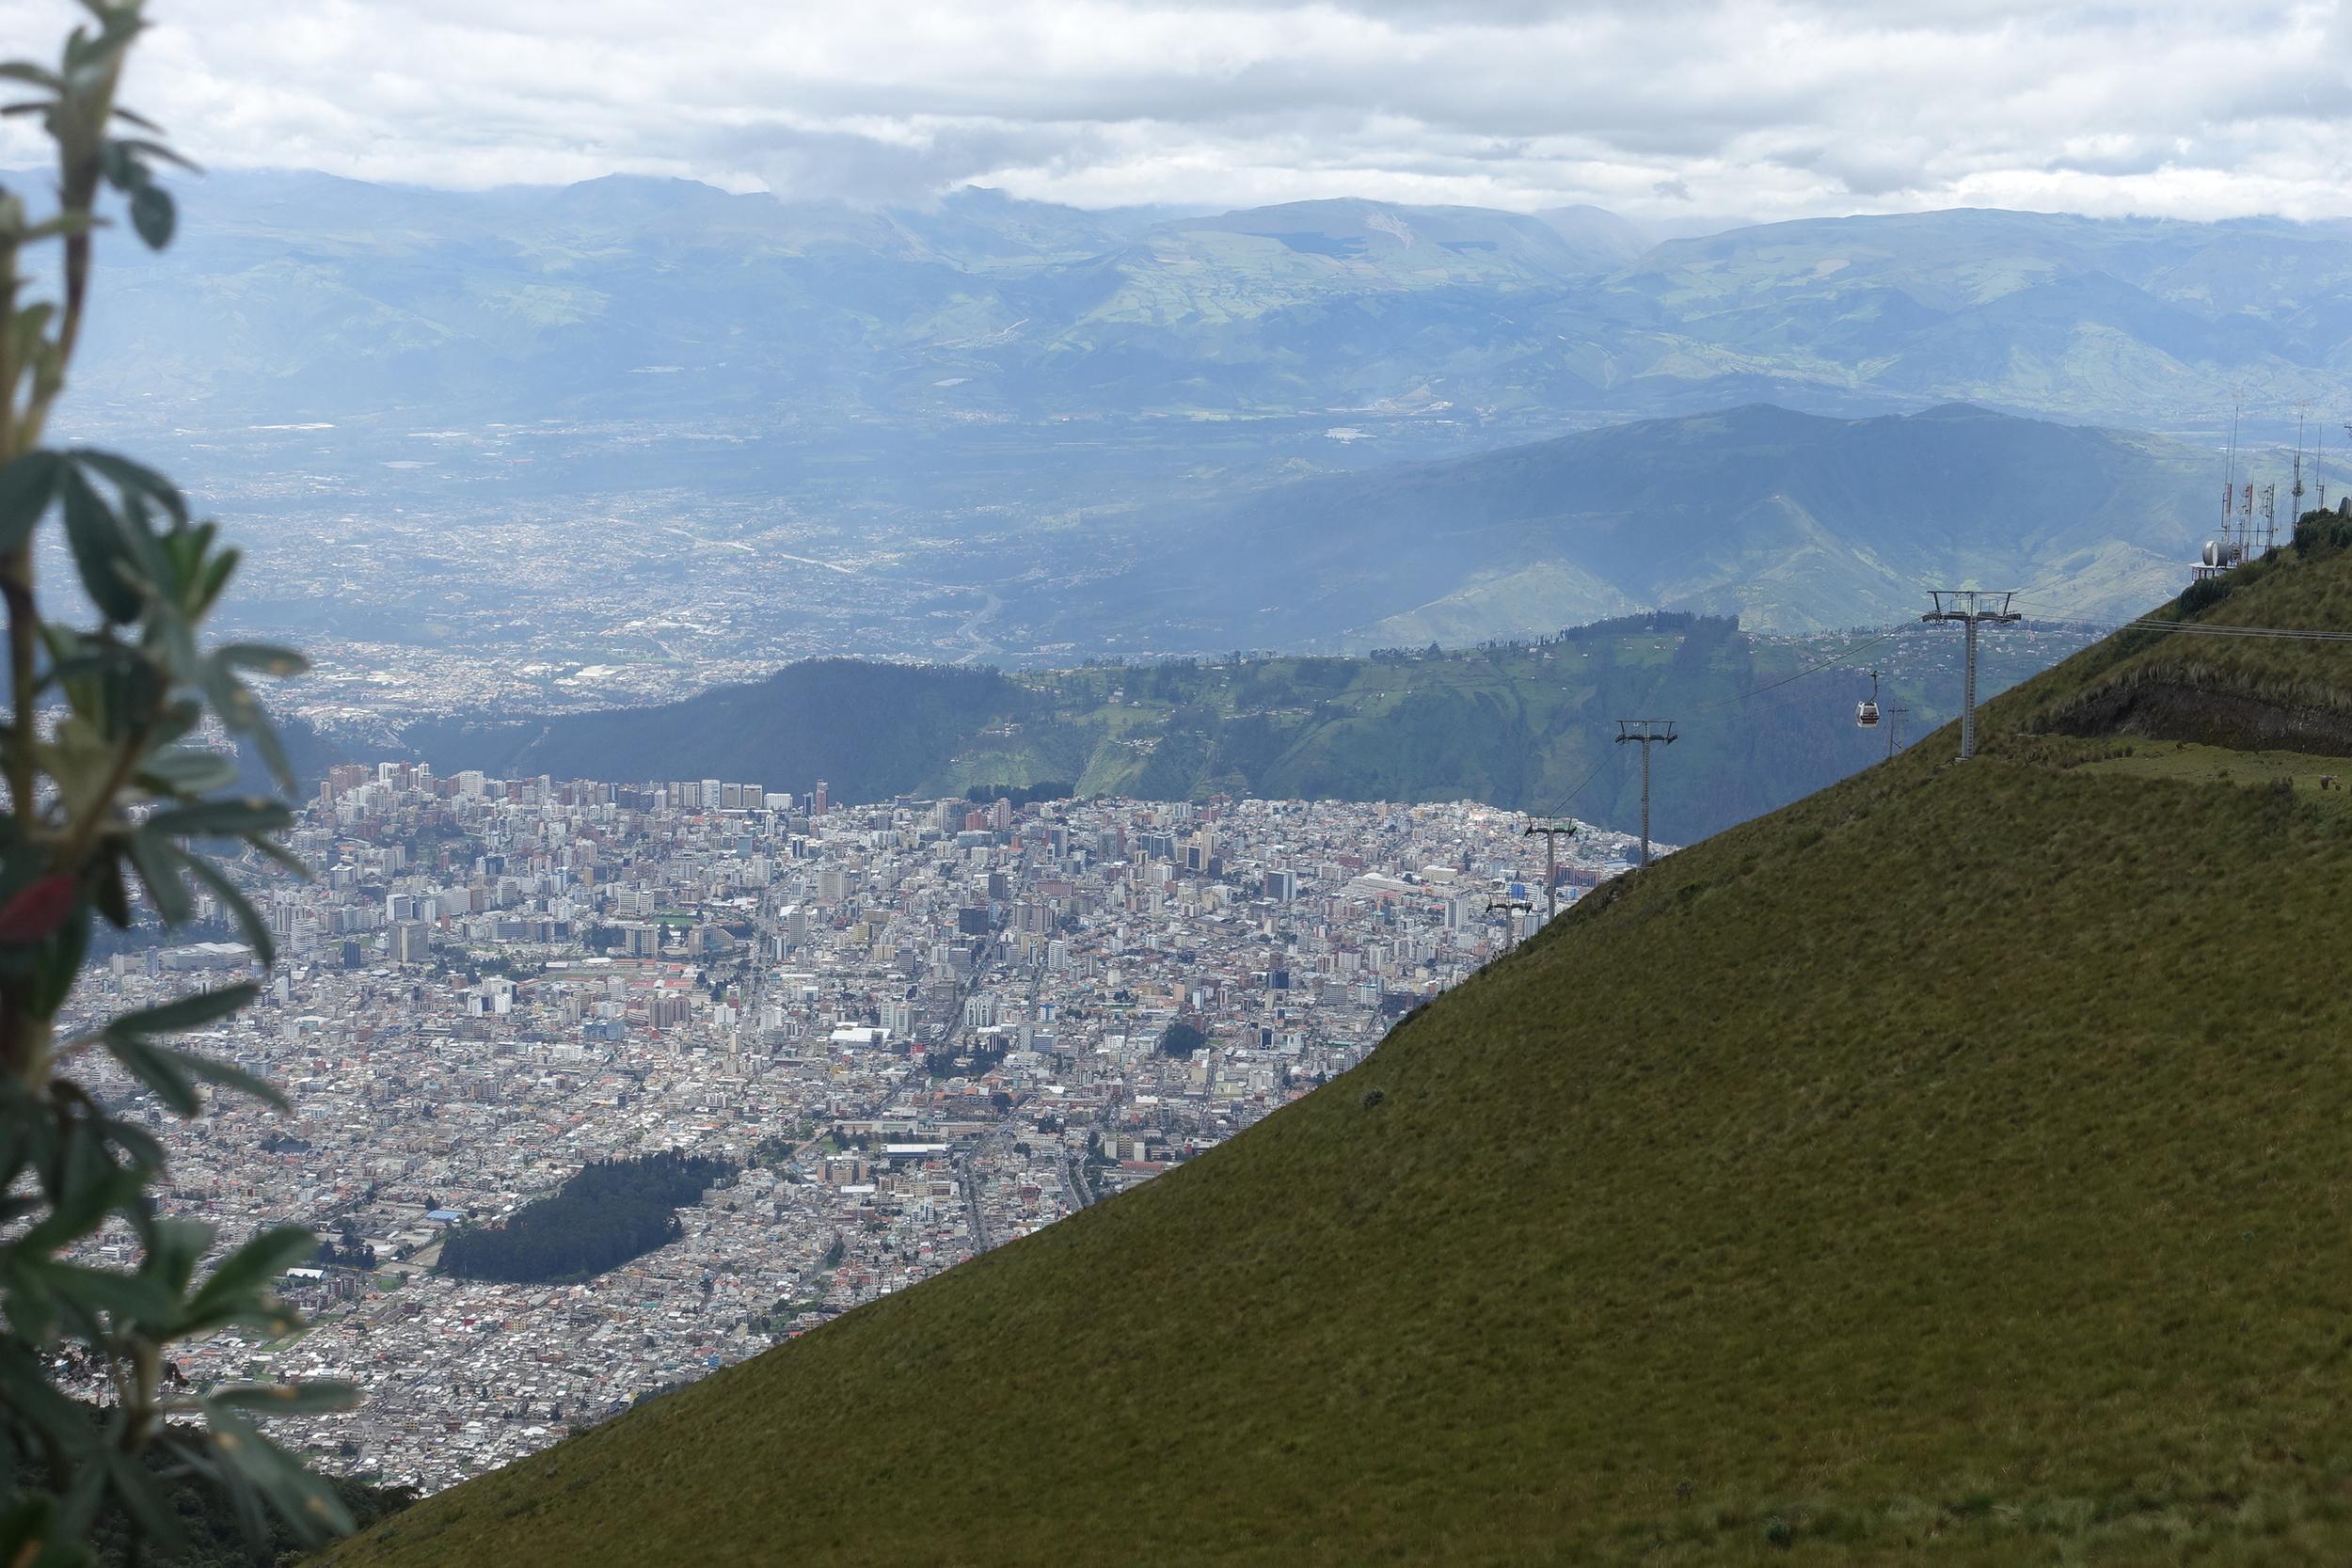 Teleferiqo and view from volcan pinchincha